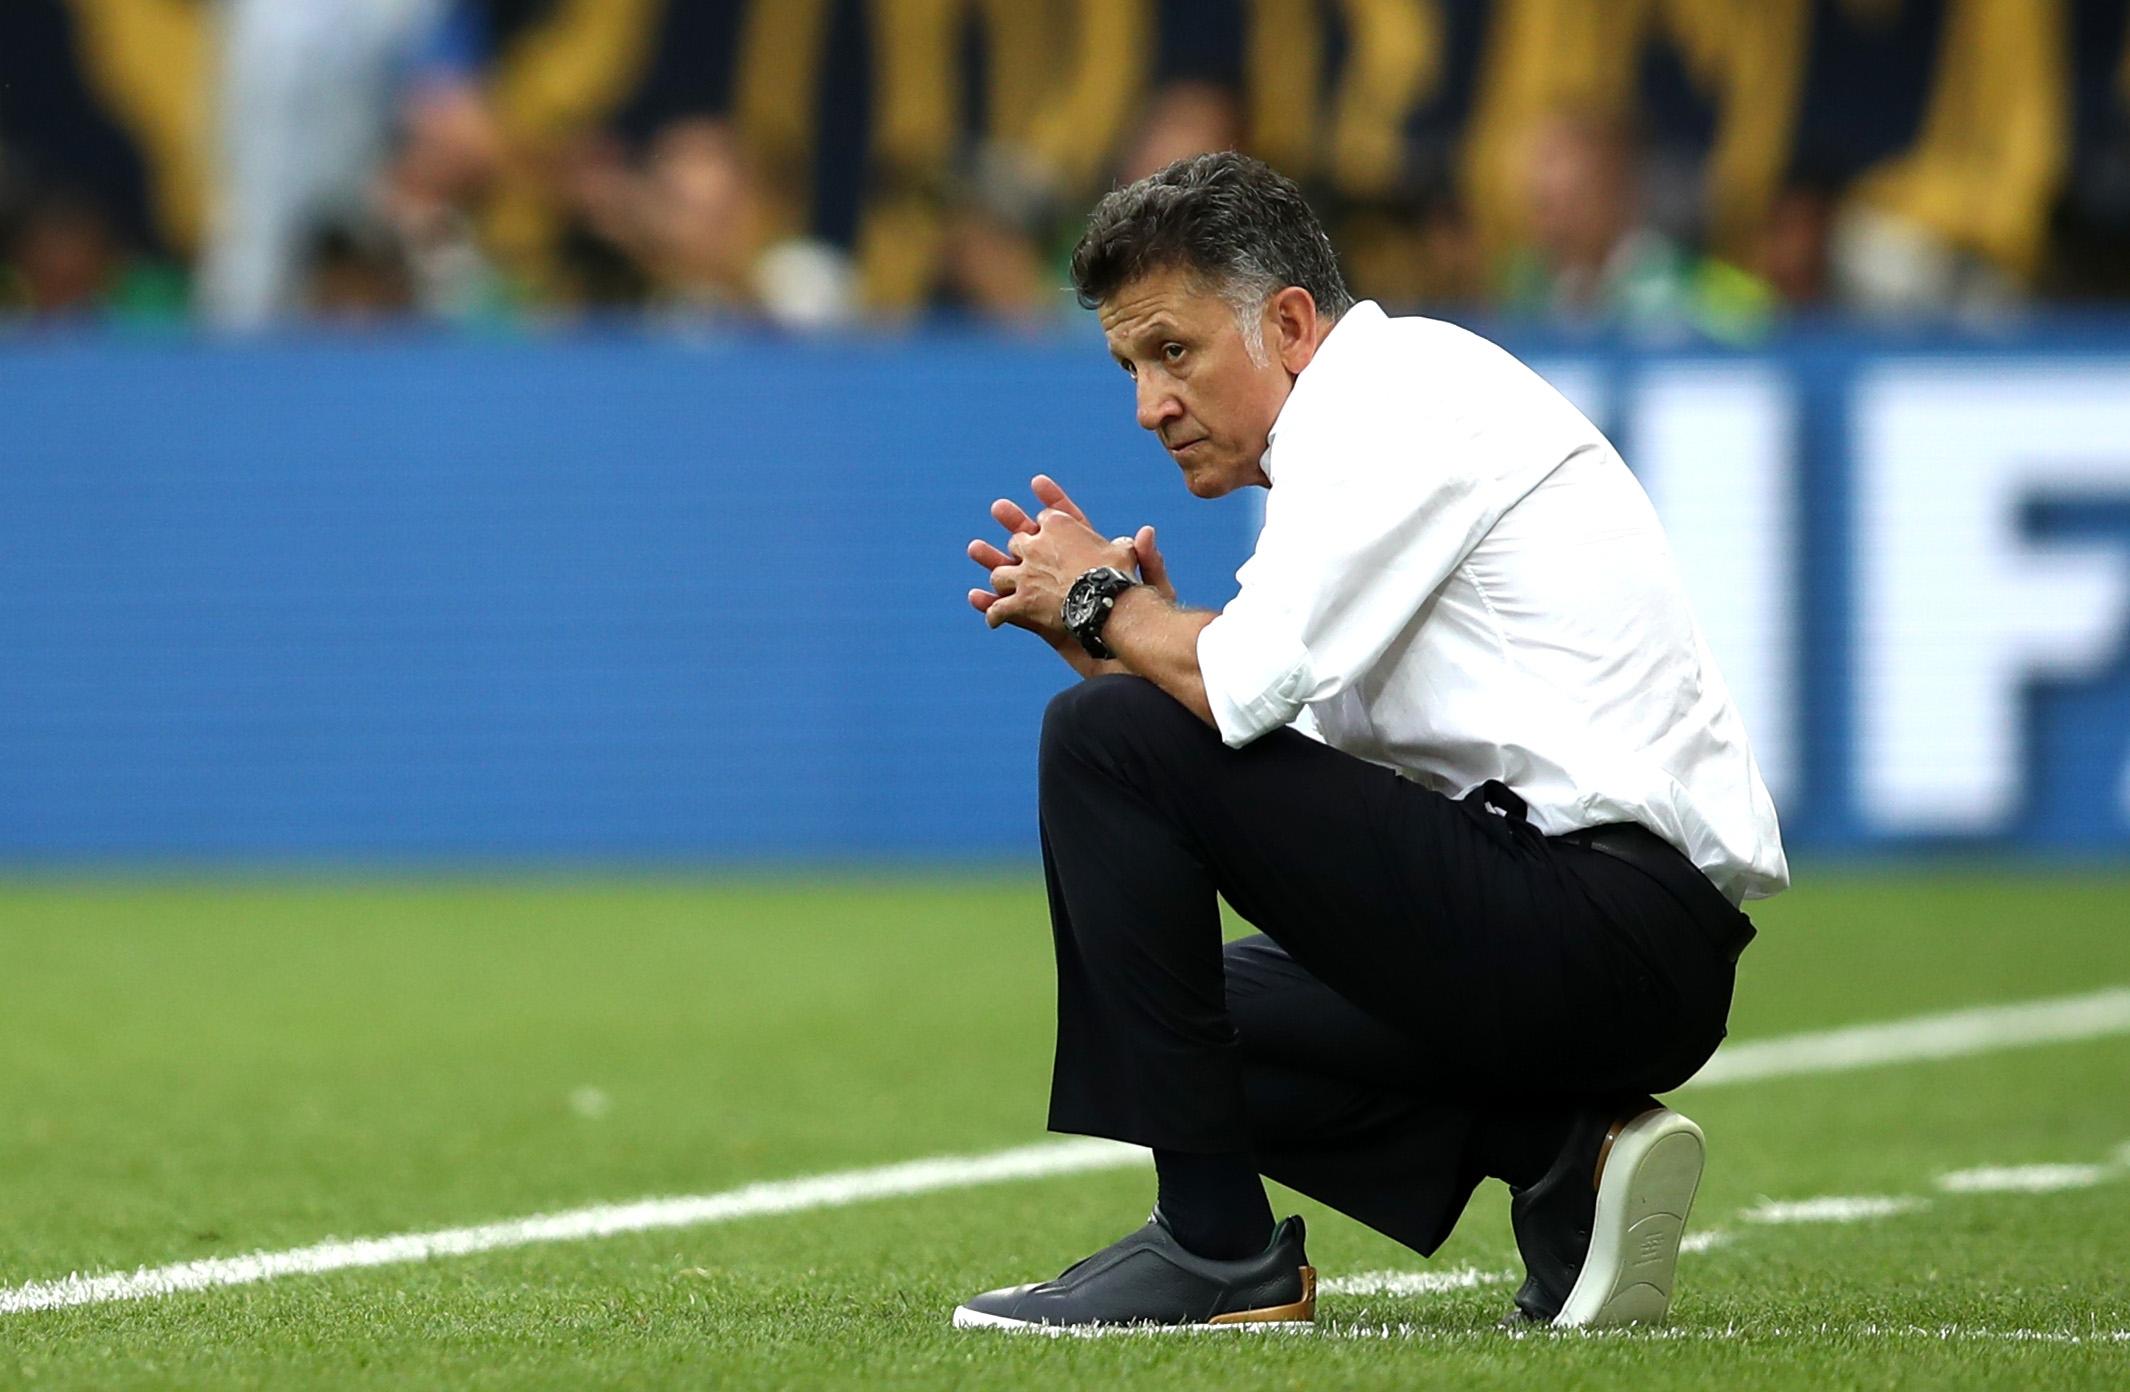 Старши треньорът на Мексико Хуан Карлос Осорио остана доволен от